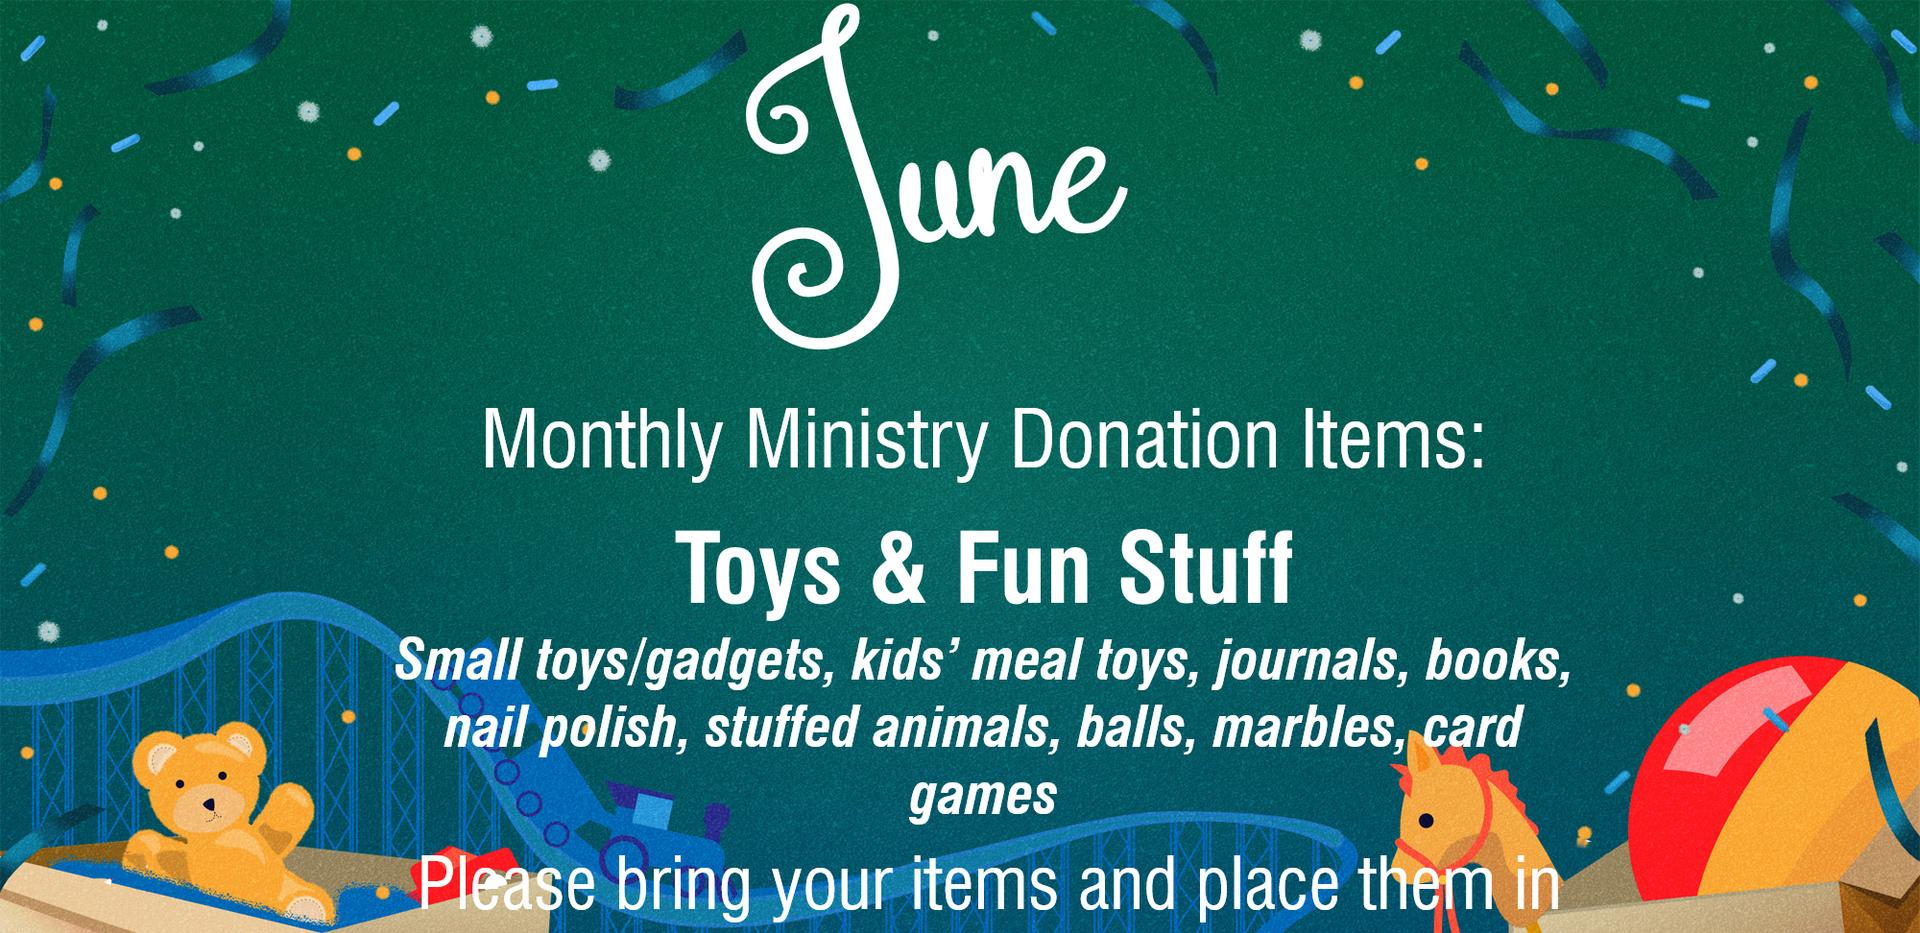 June Donations